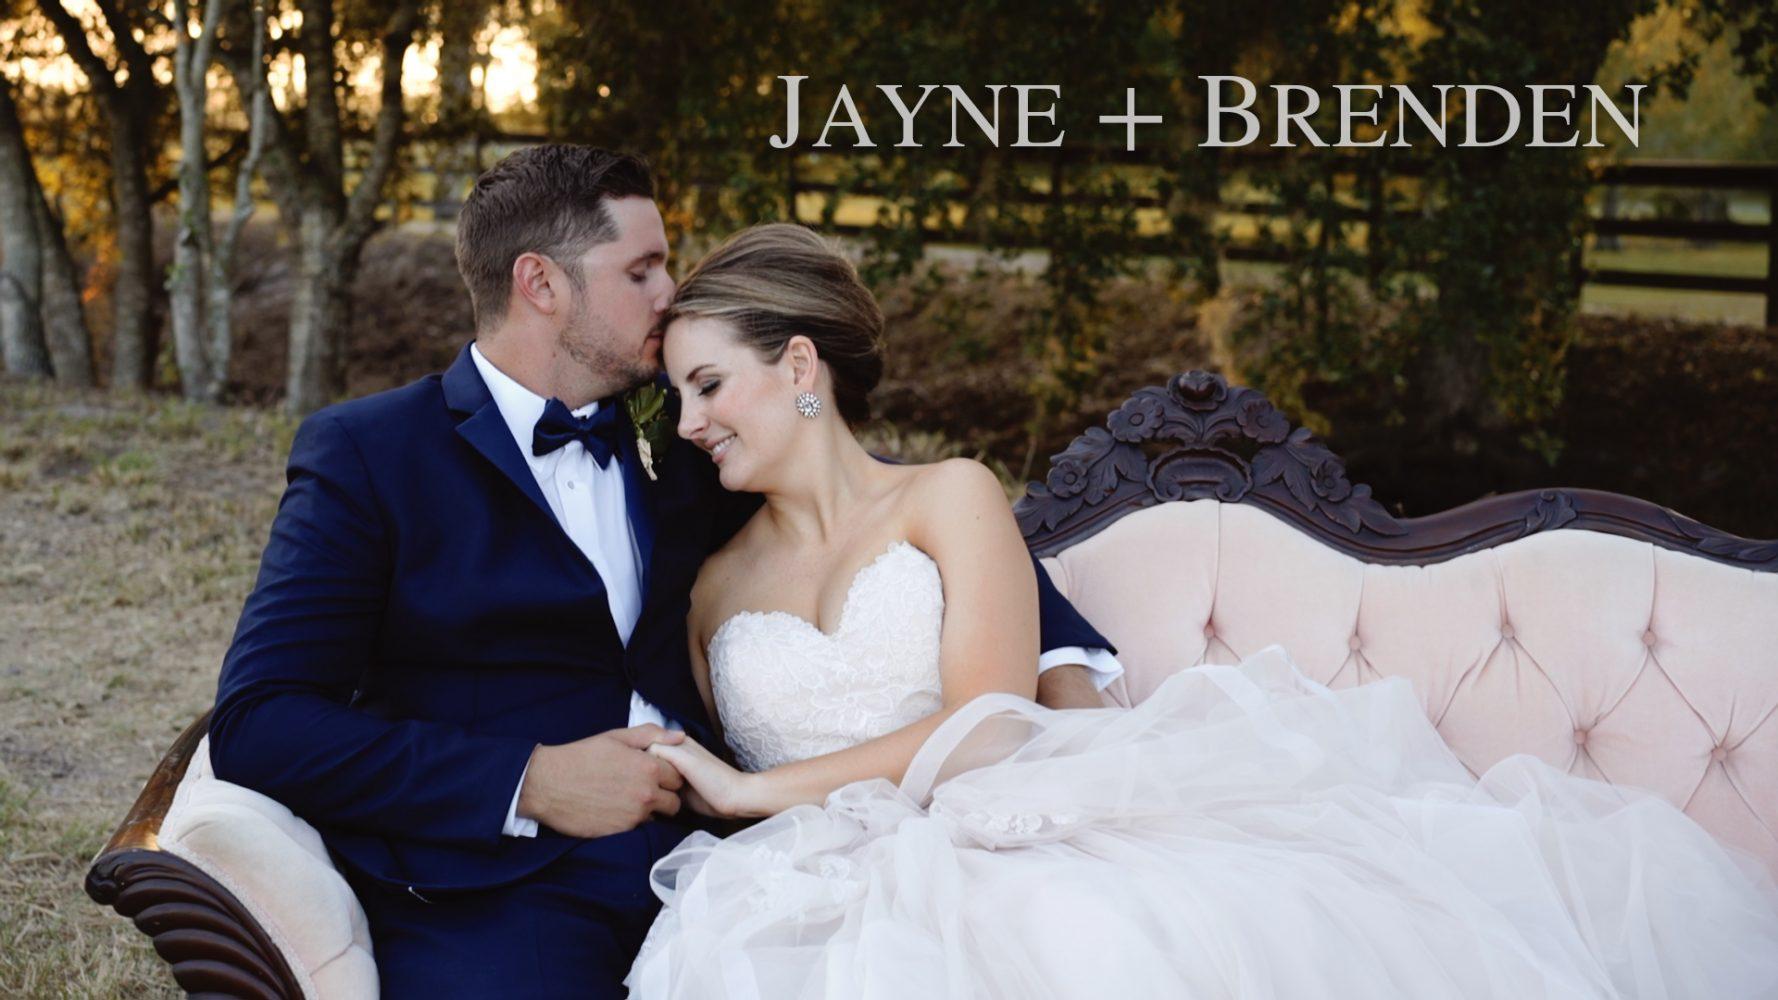 Jayne + Brenden | Okeechobee, Florida | J-5 Ranch